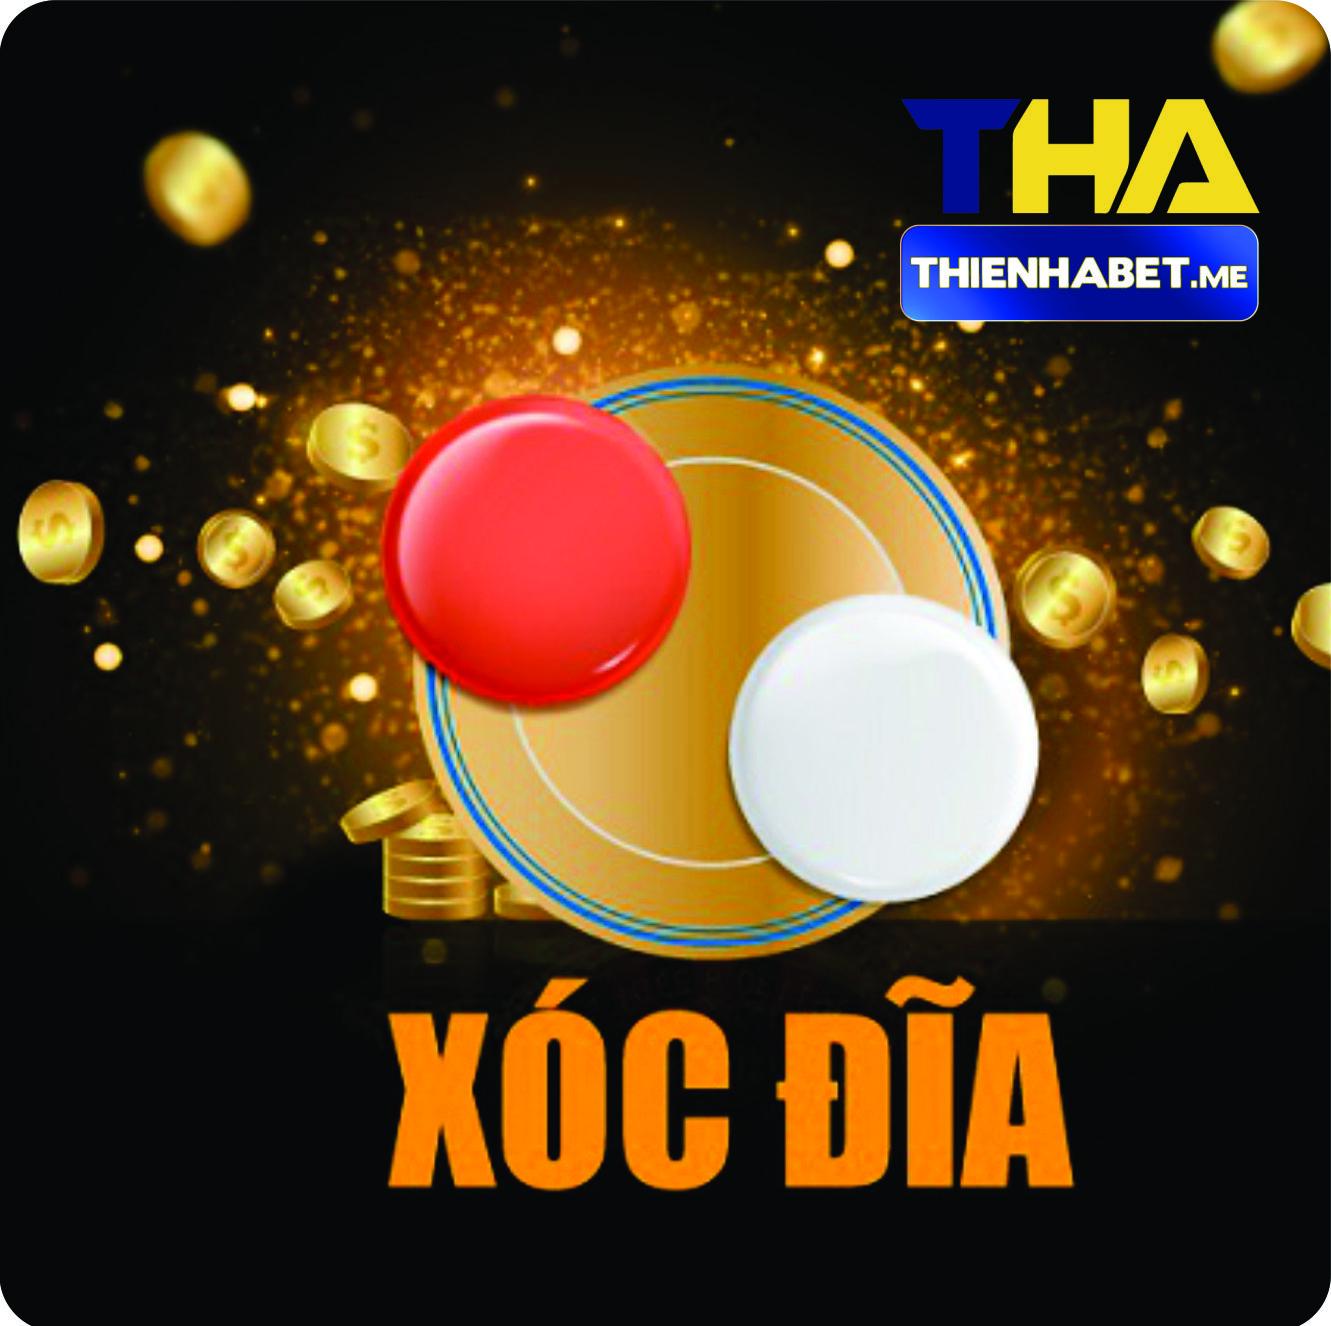 Xóc đĩa online Thienhabet